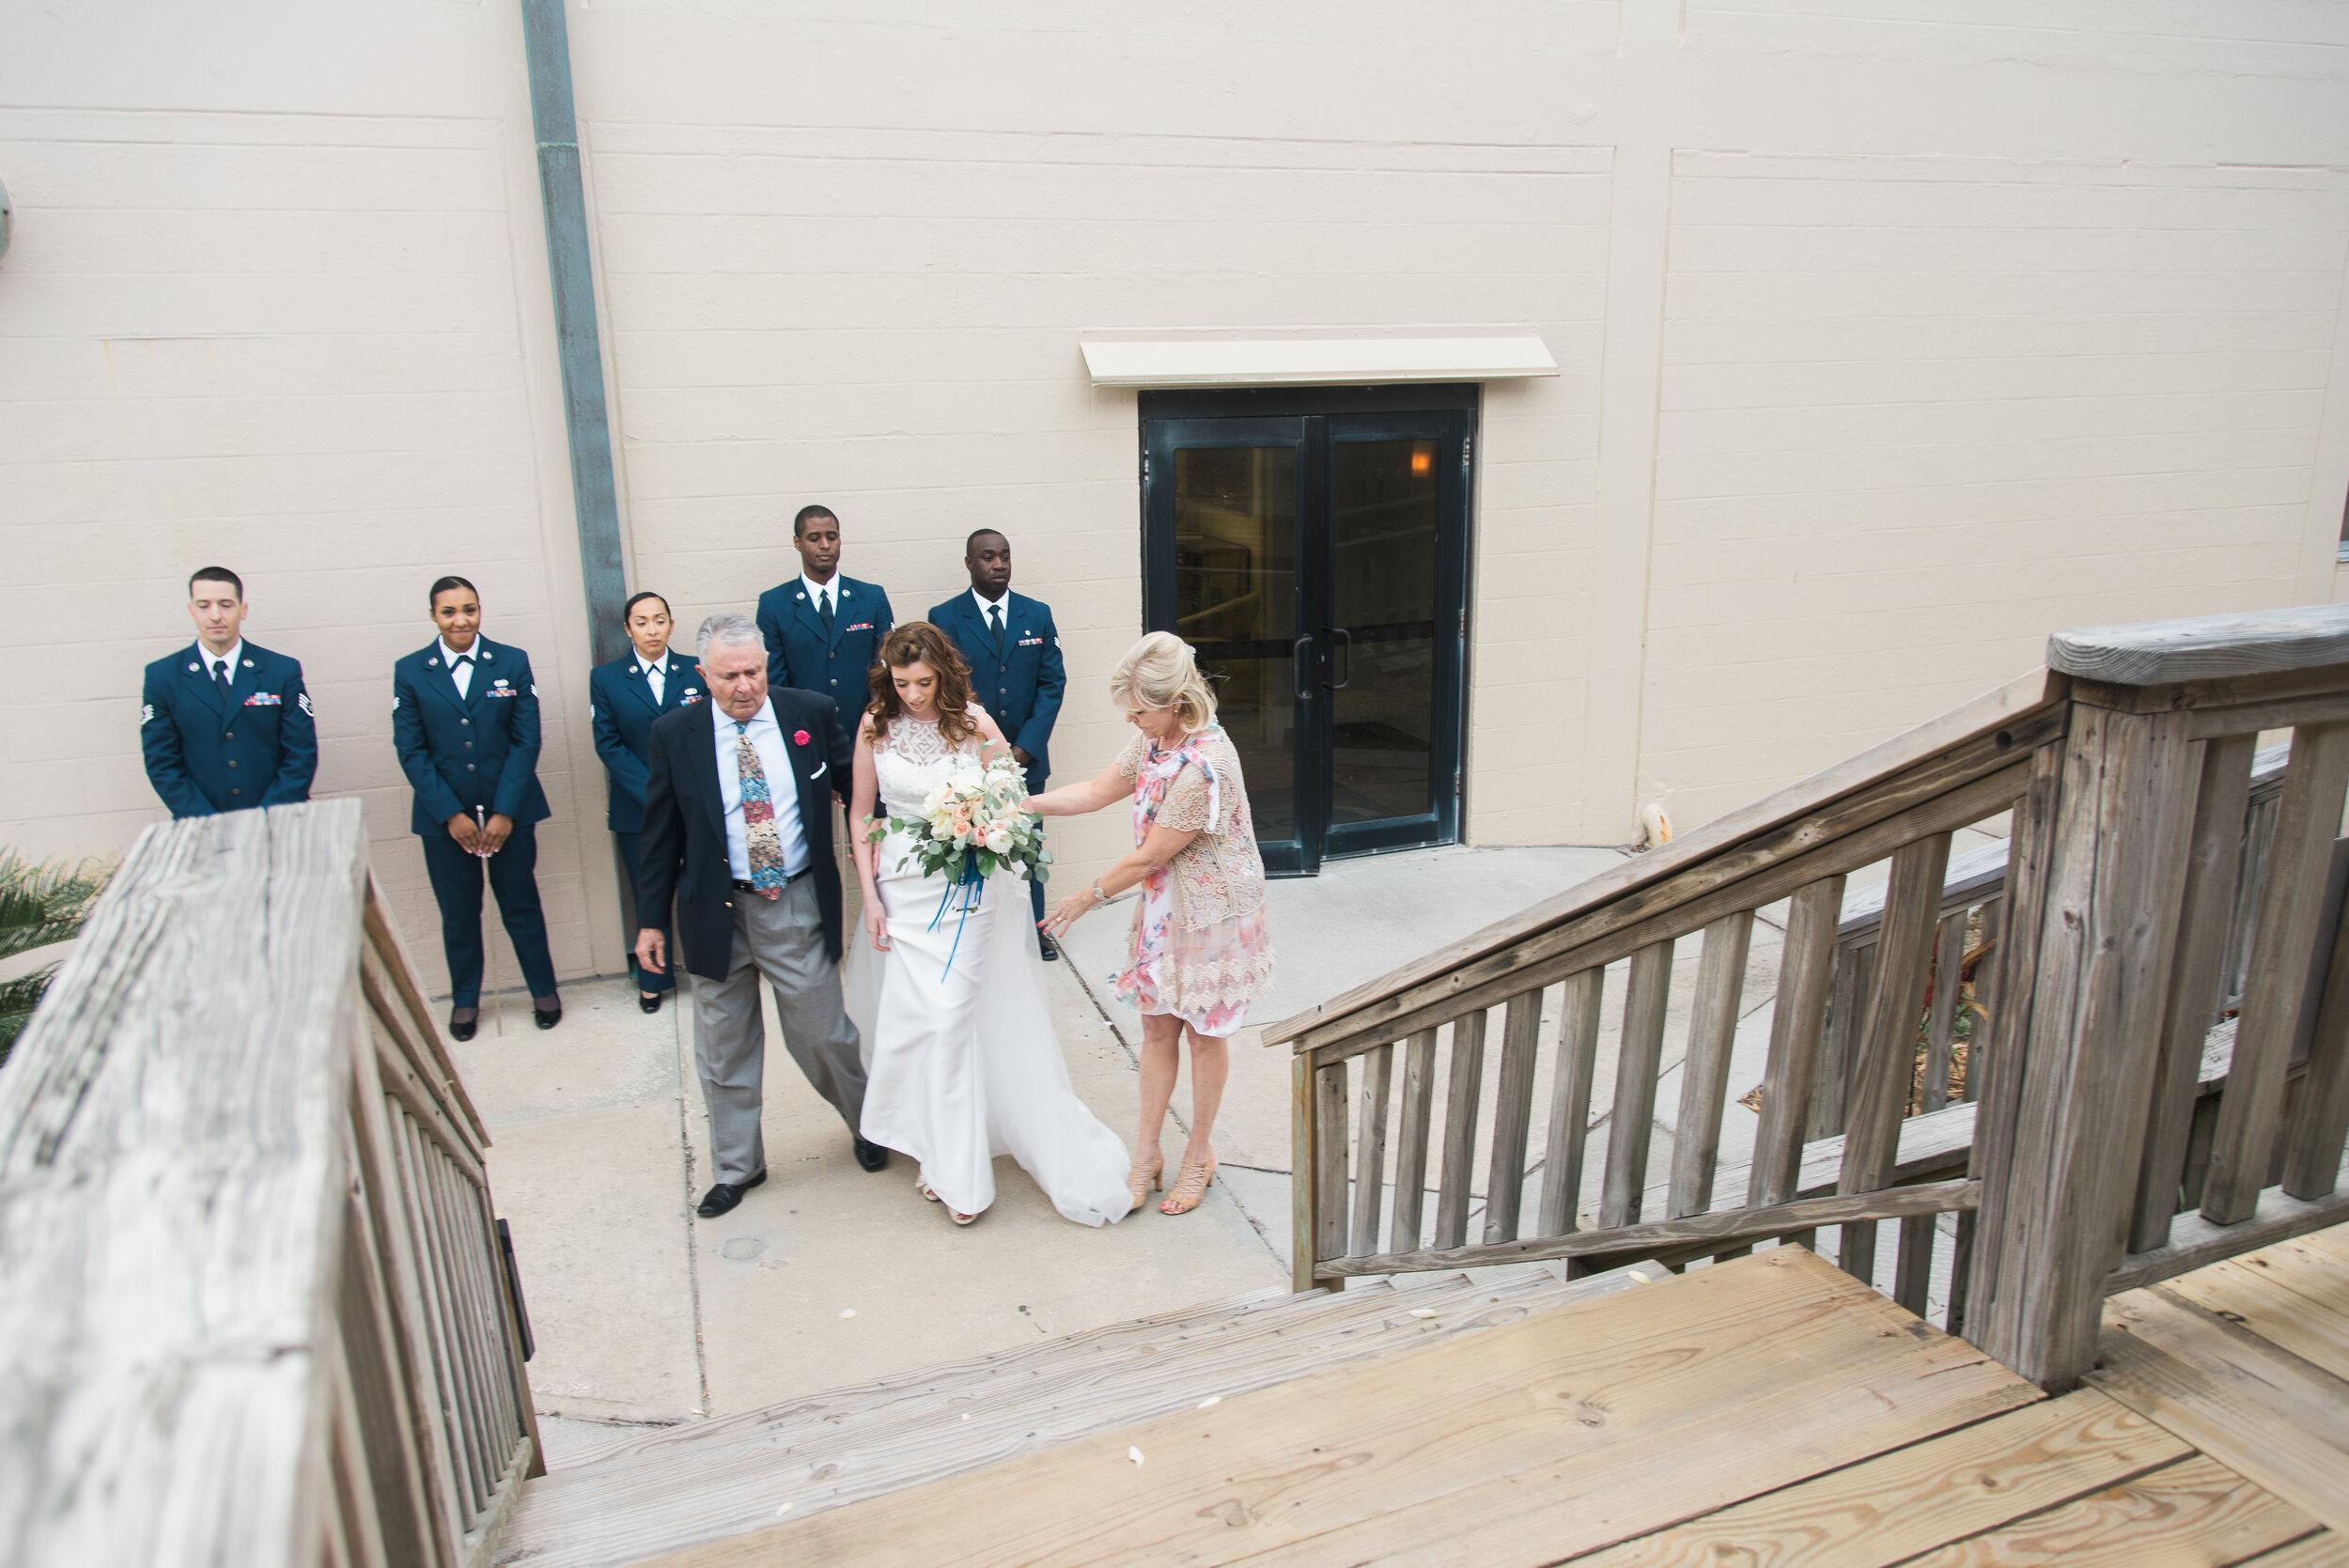 andru-the-tide-club-air-force-wedding-patrickafb-1-28.jpg